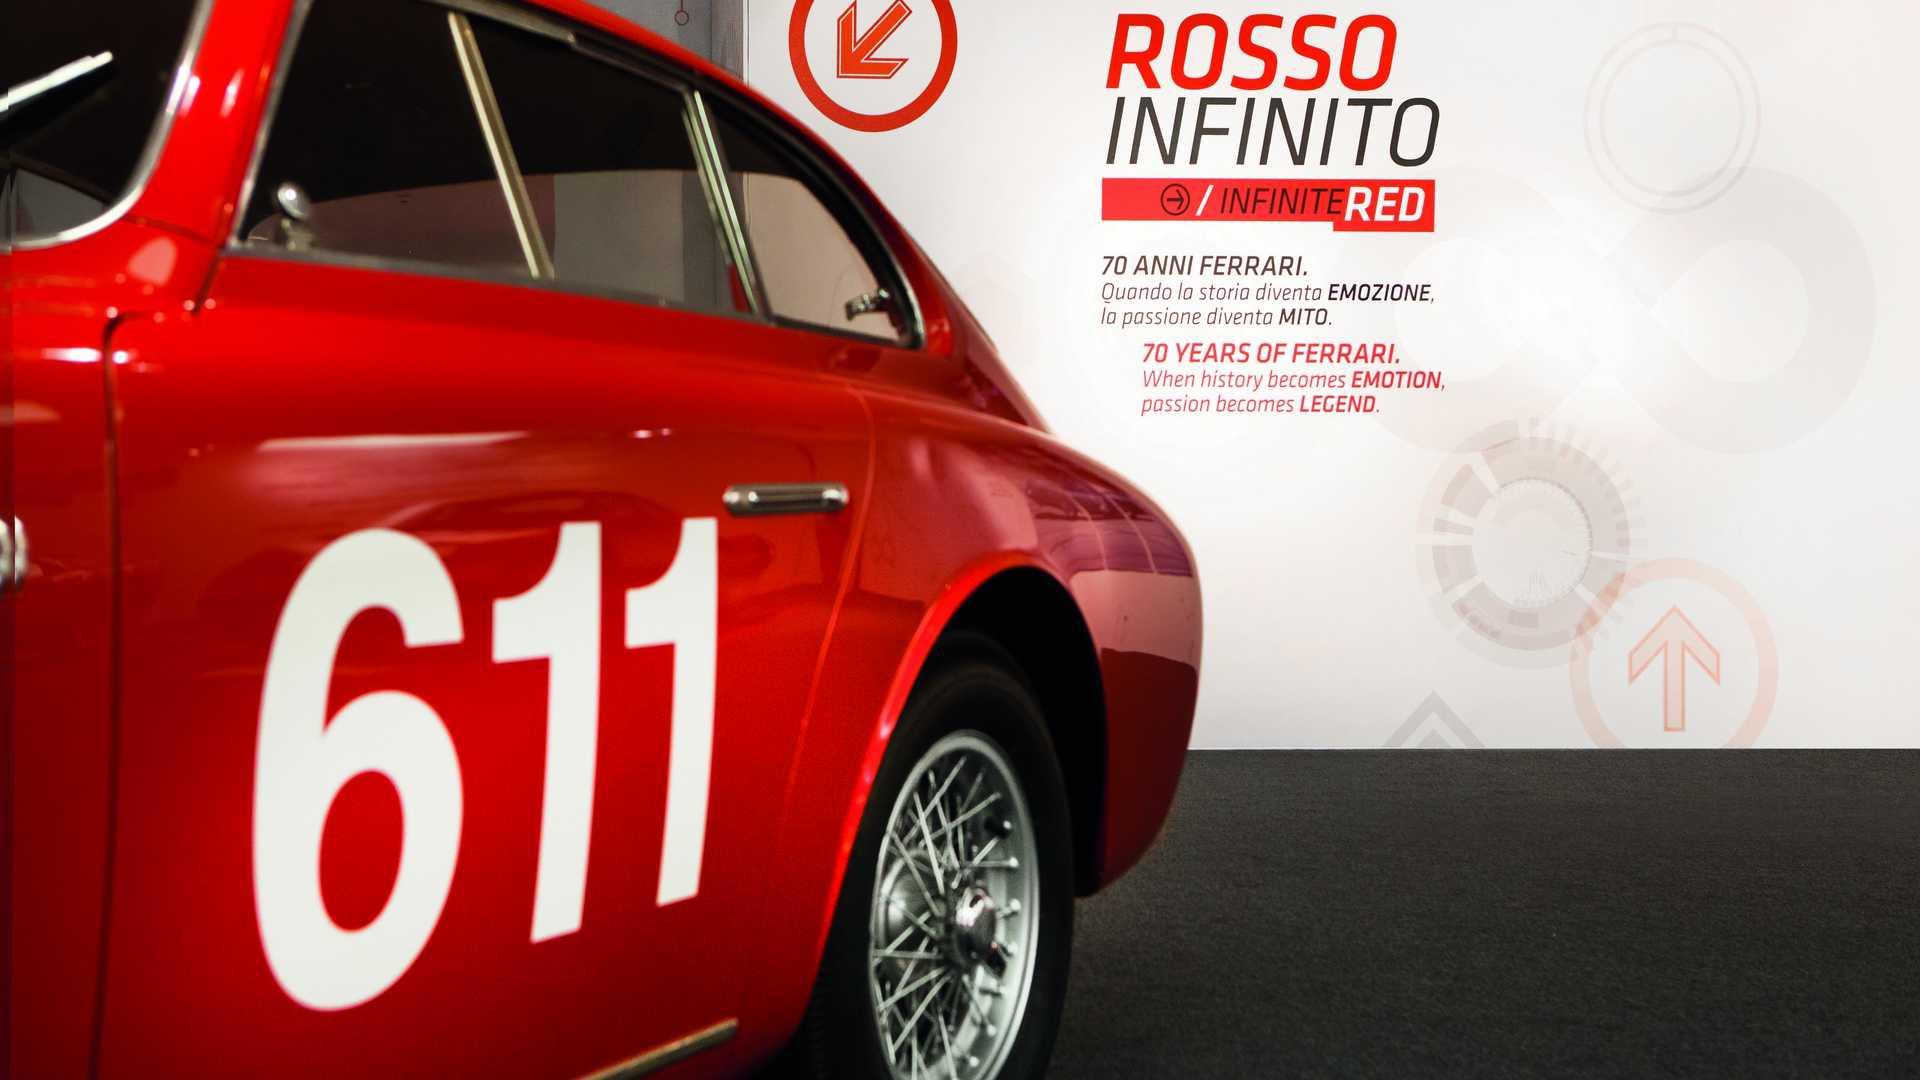 Expanded_Ferrari_Museum_in_Maranello_12